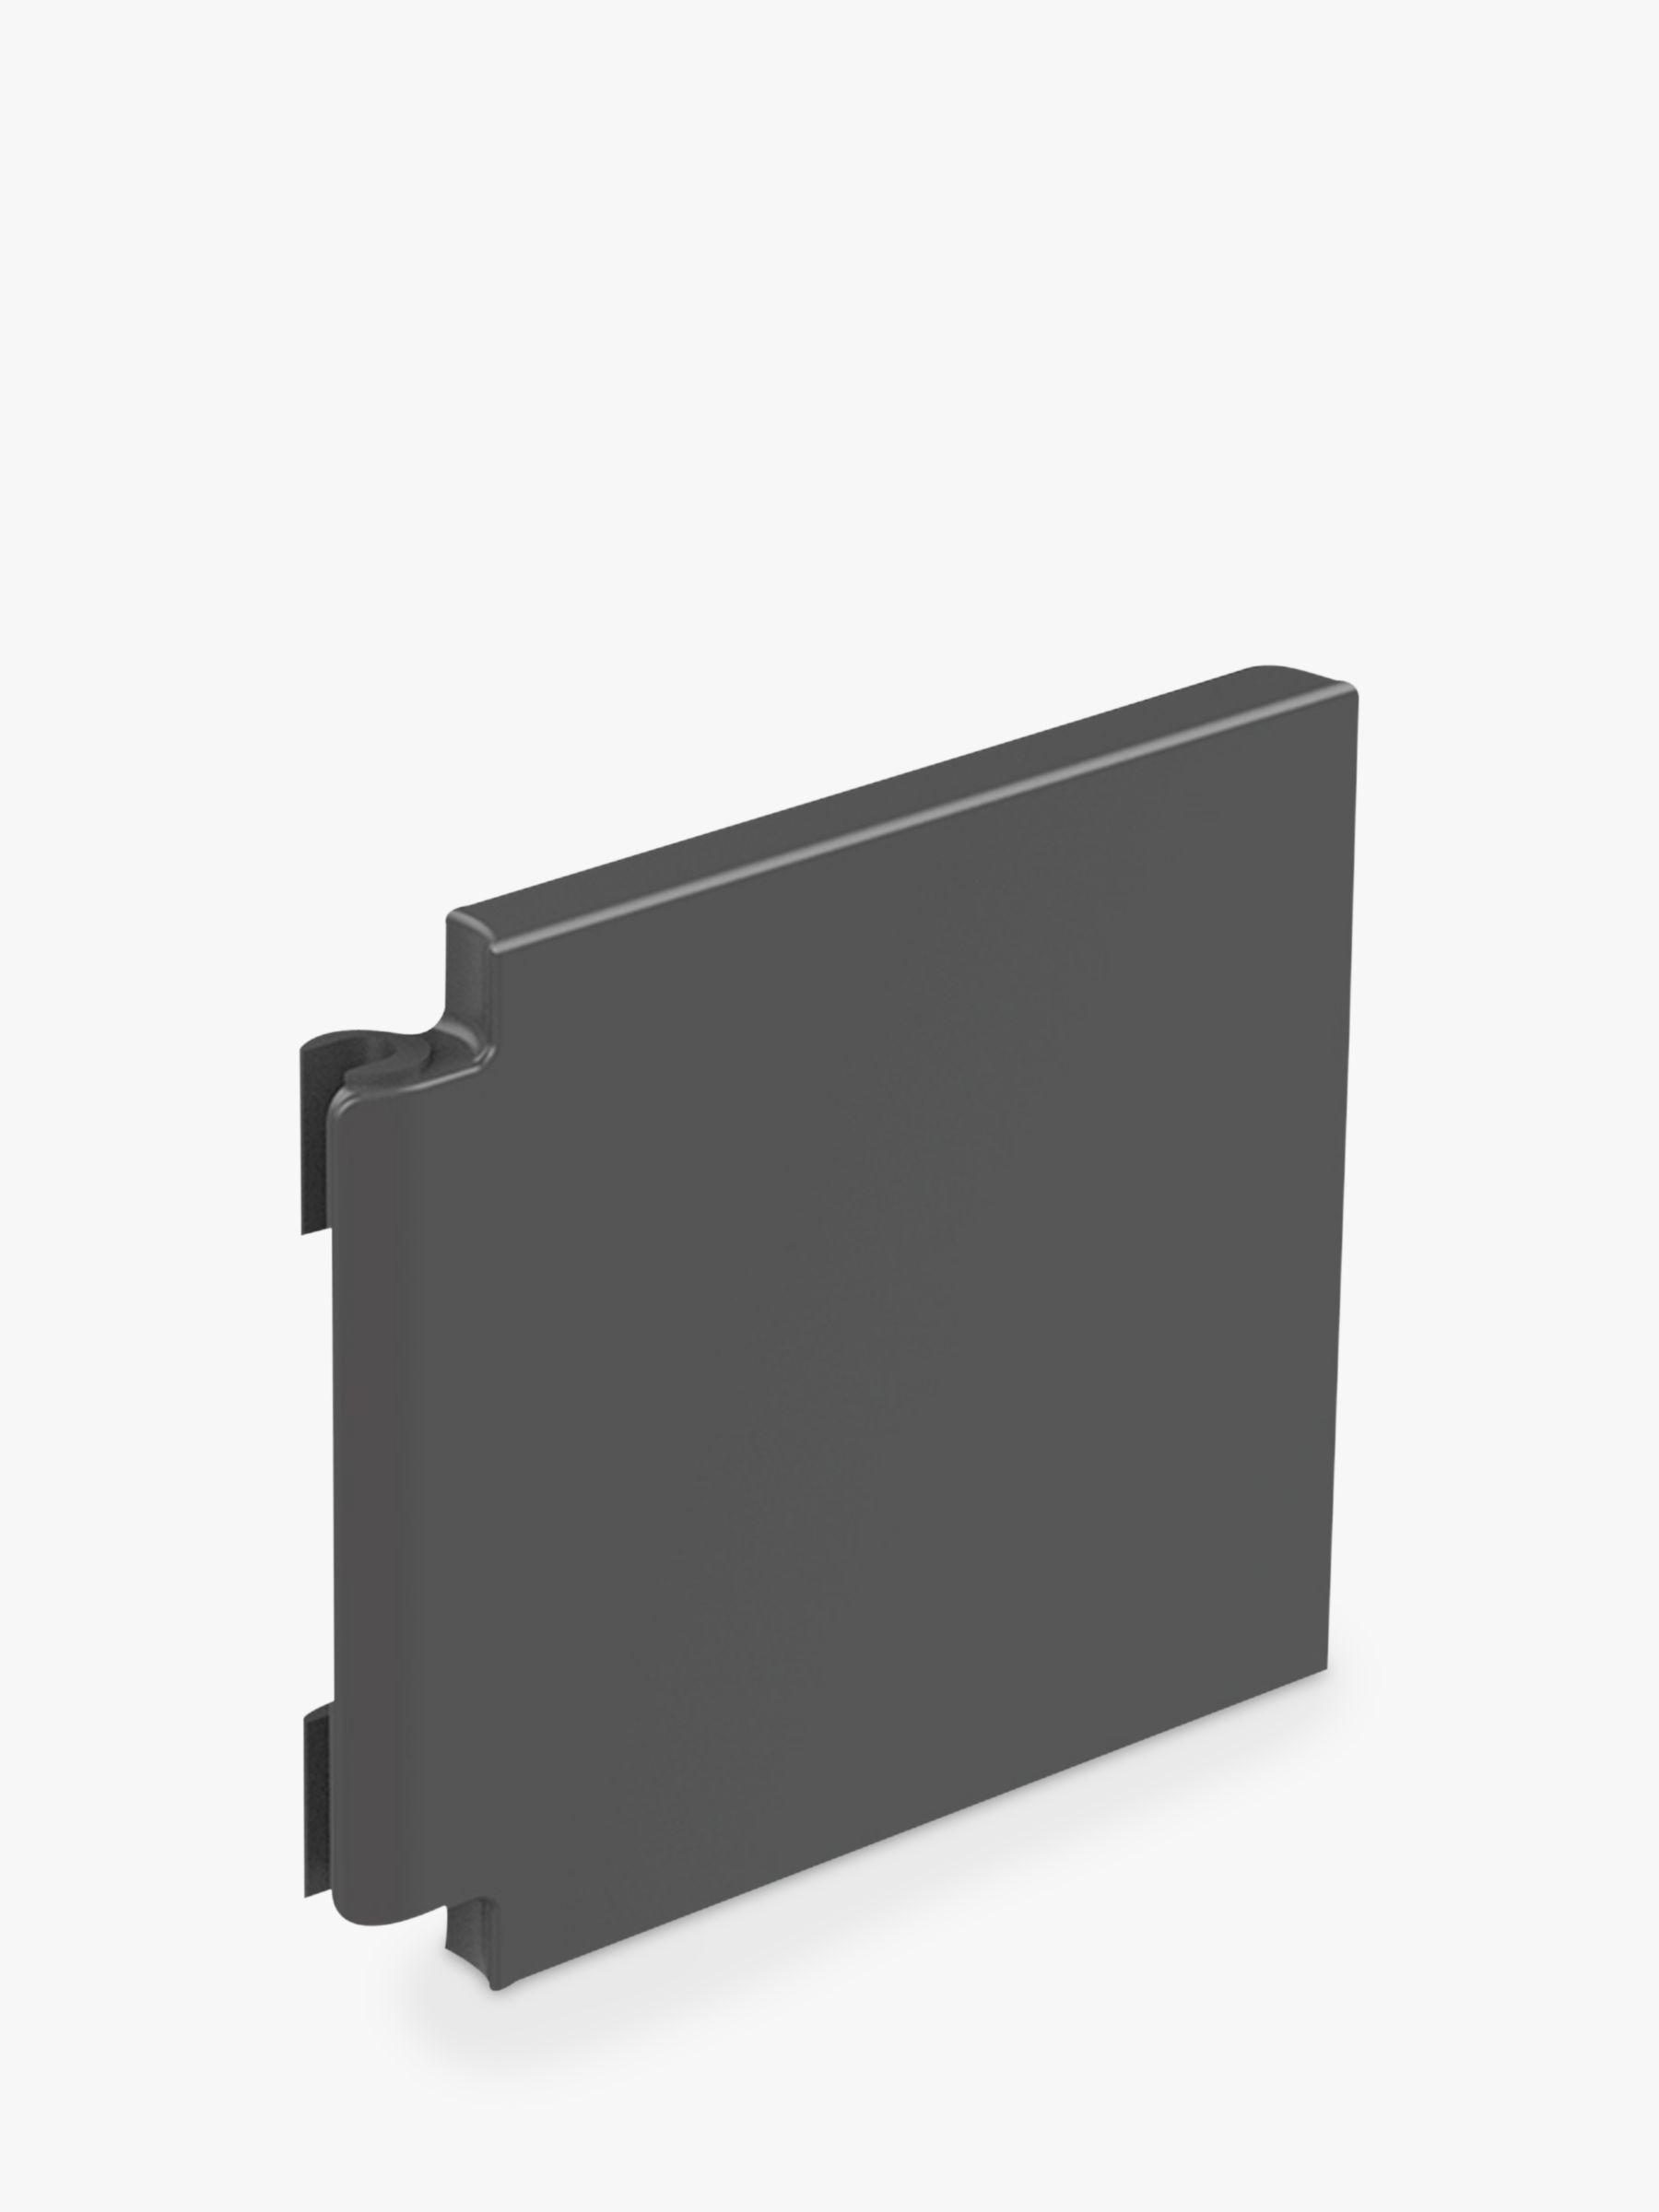 Gopro GoPro Replacement Door for HERO5 Session